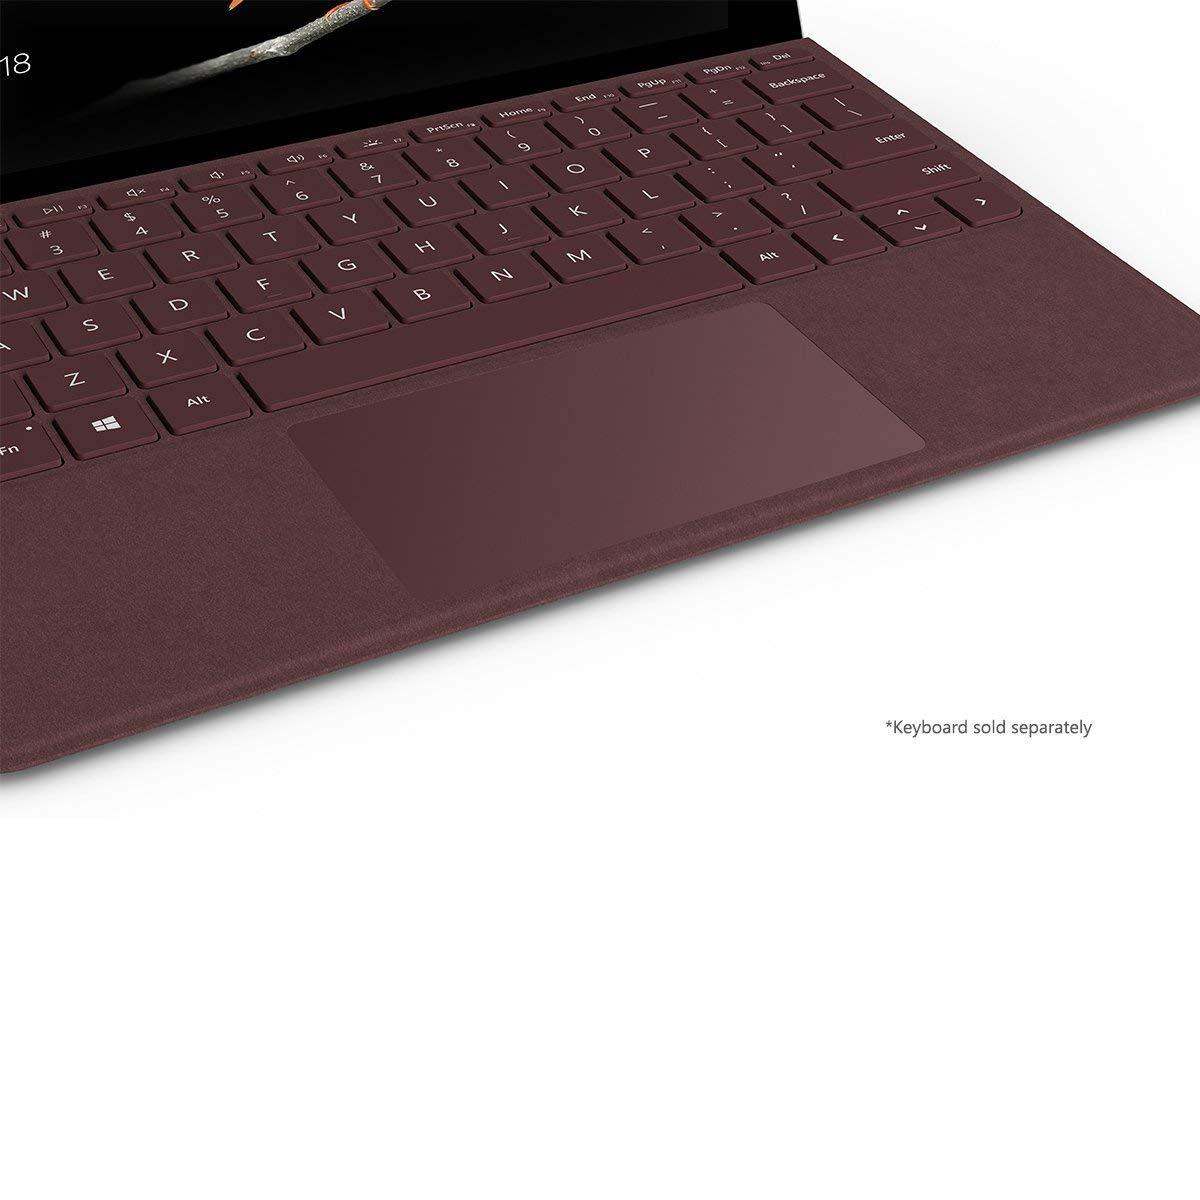 New Microsoft Surface Go (Intel Pentium Gold, 4GB RAM, 64GB) by Microsoft (Image #8)